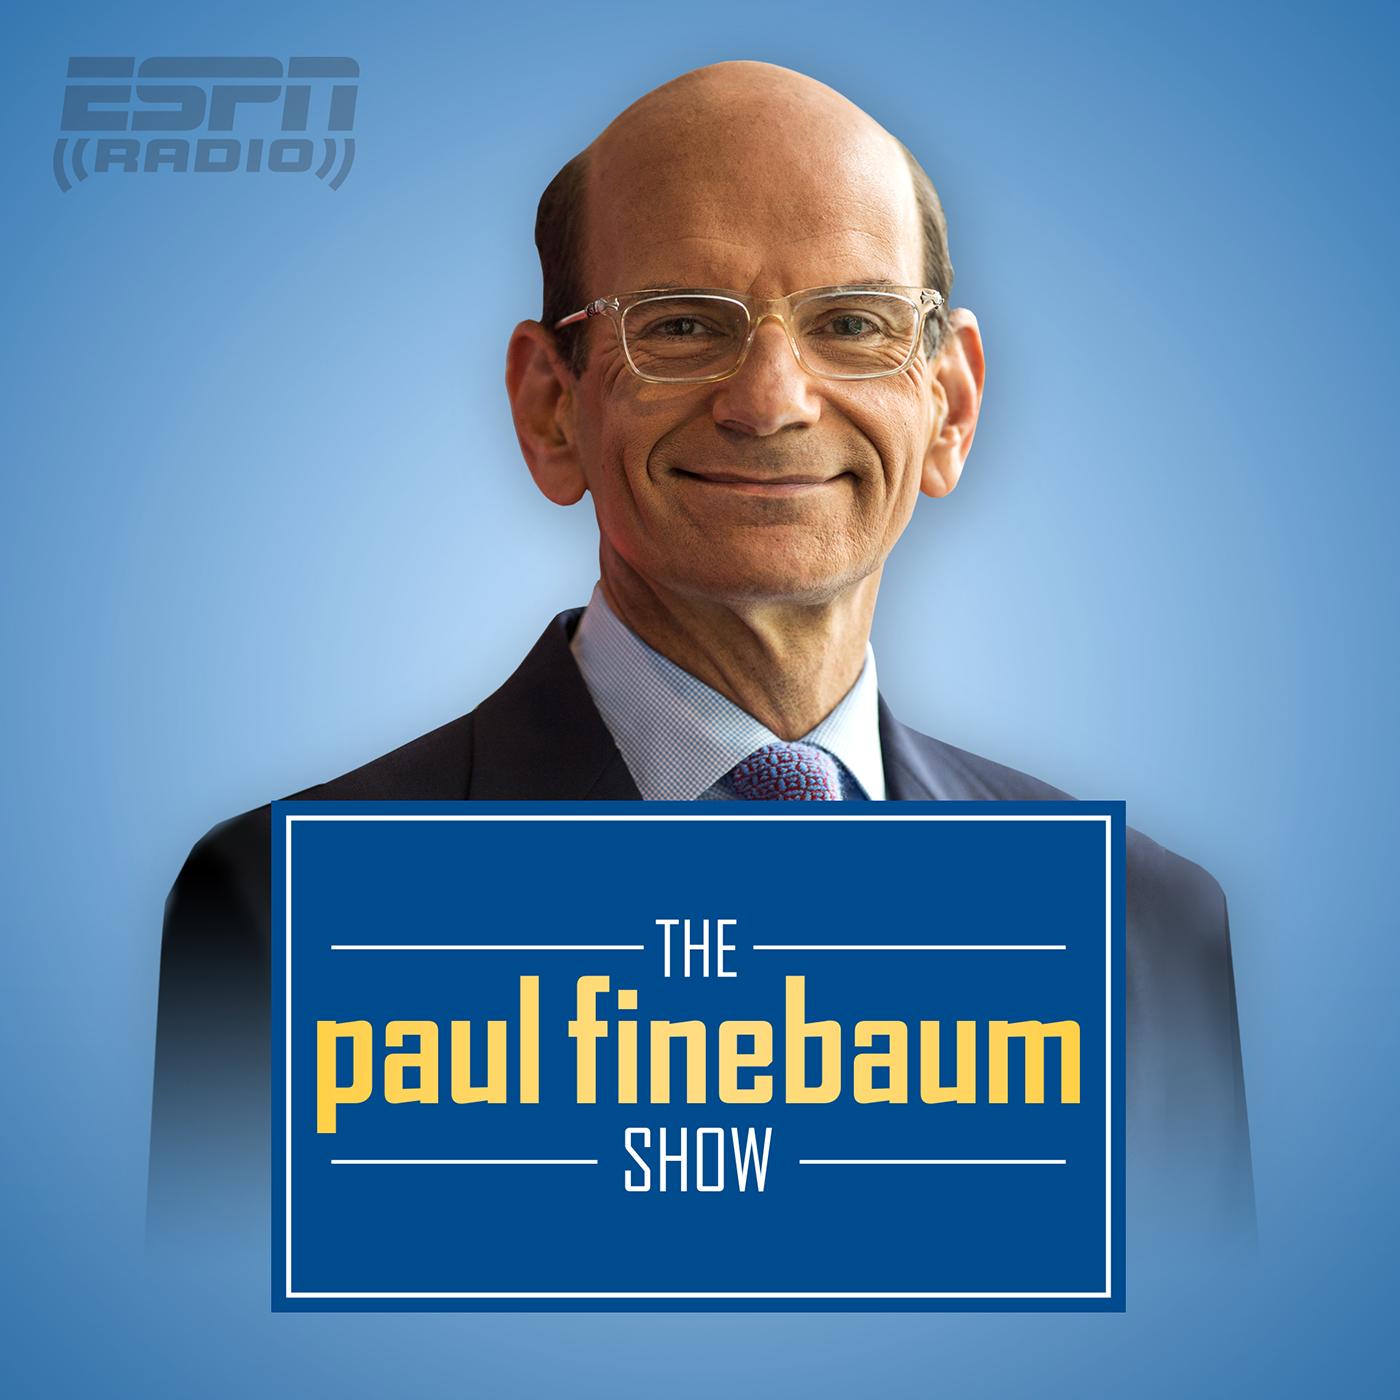 The Paul Finebaum Show